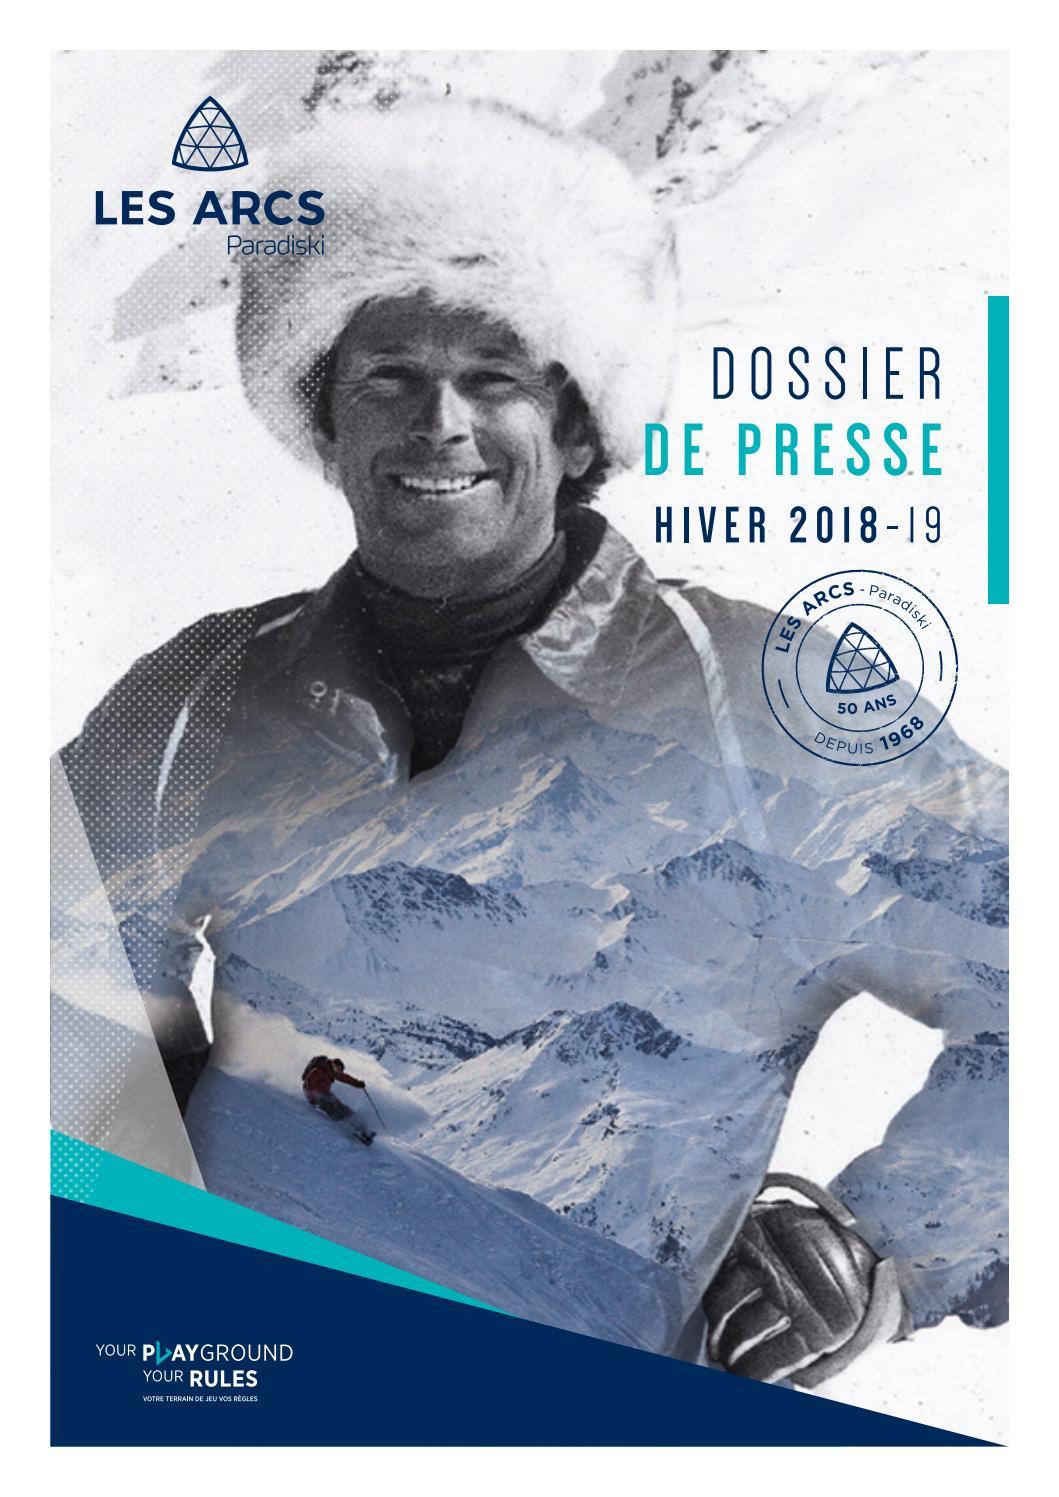 Dossier Presse Hiver 2018-2019 by Bourg Saint Maurice - Les Arcs - issuu f990809c1165